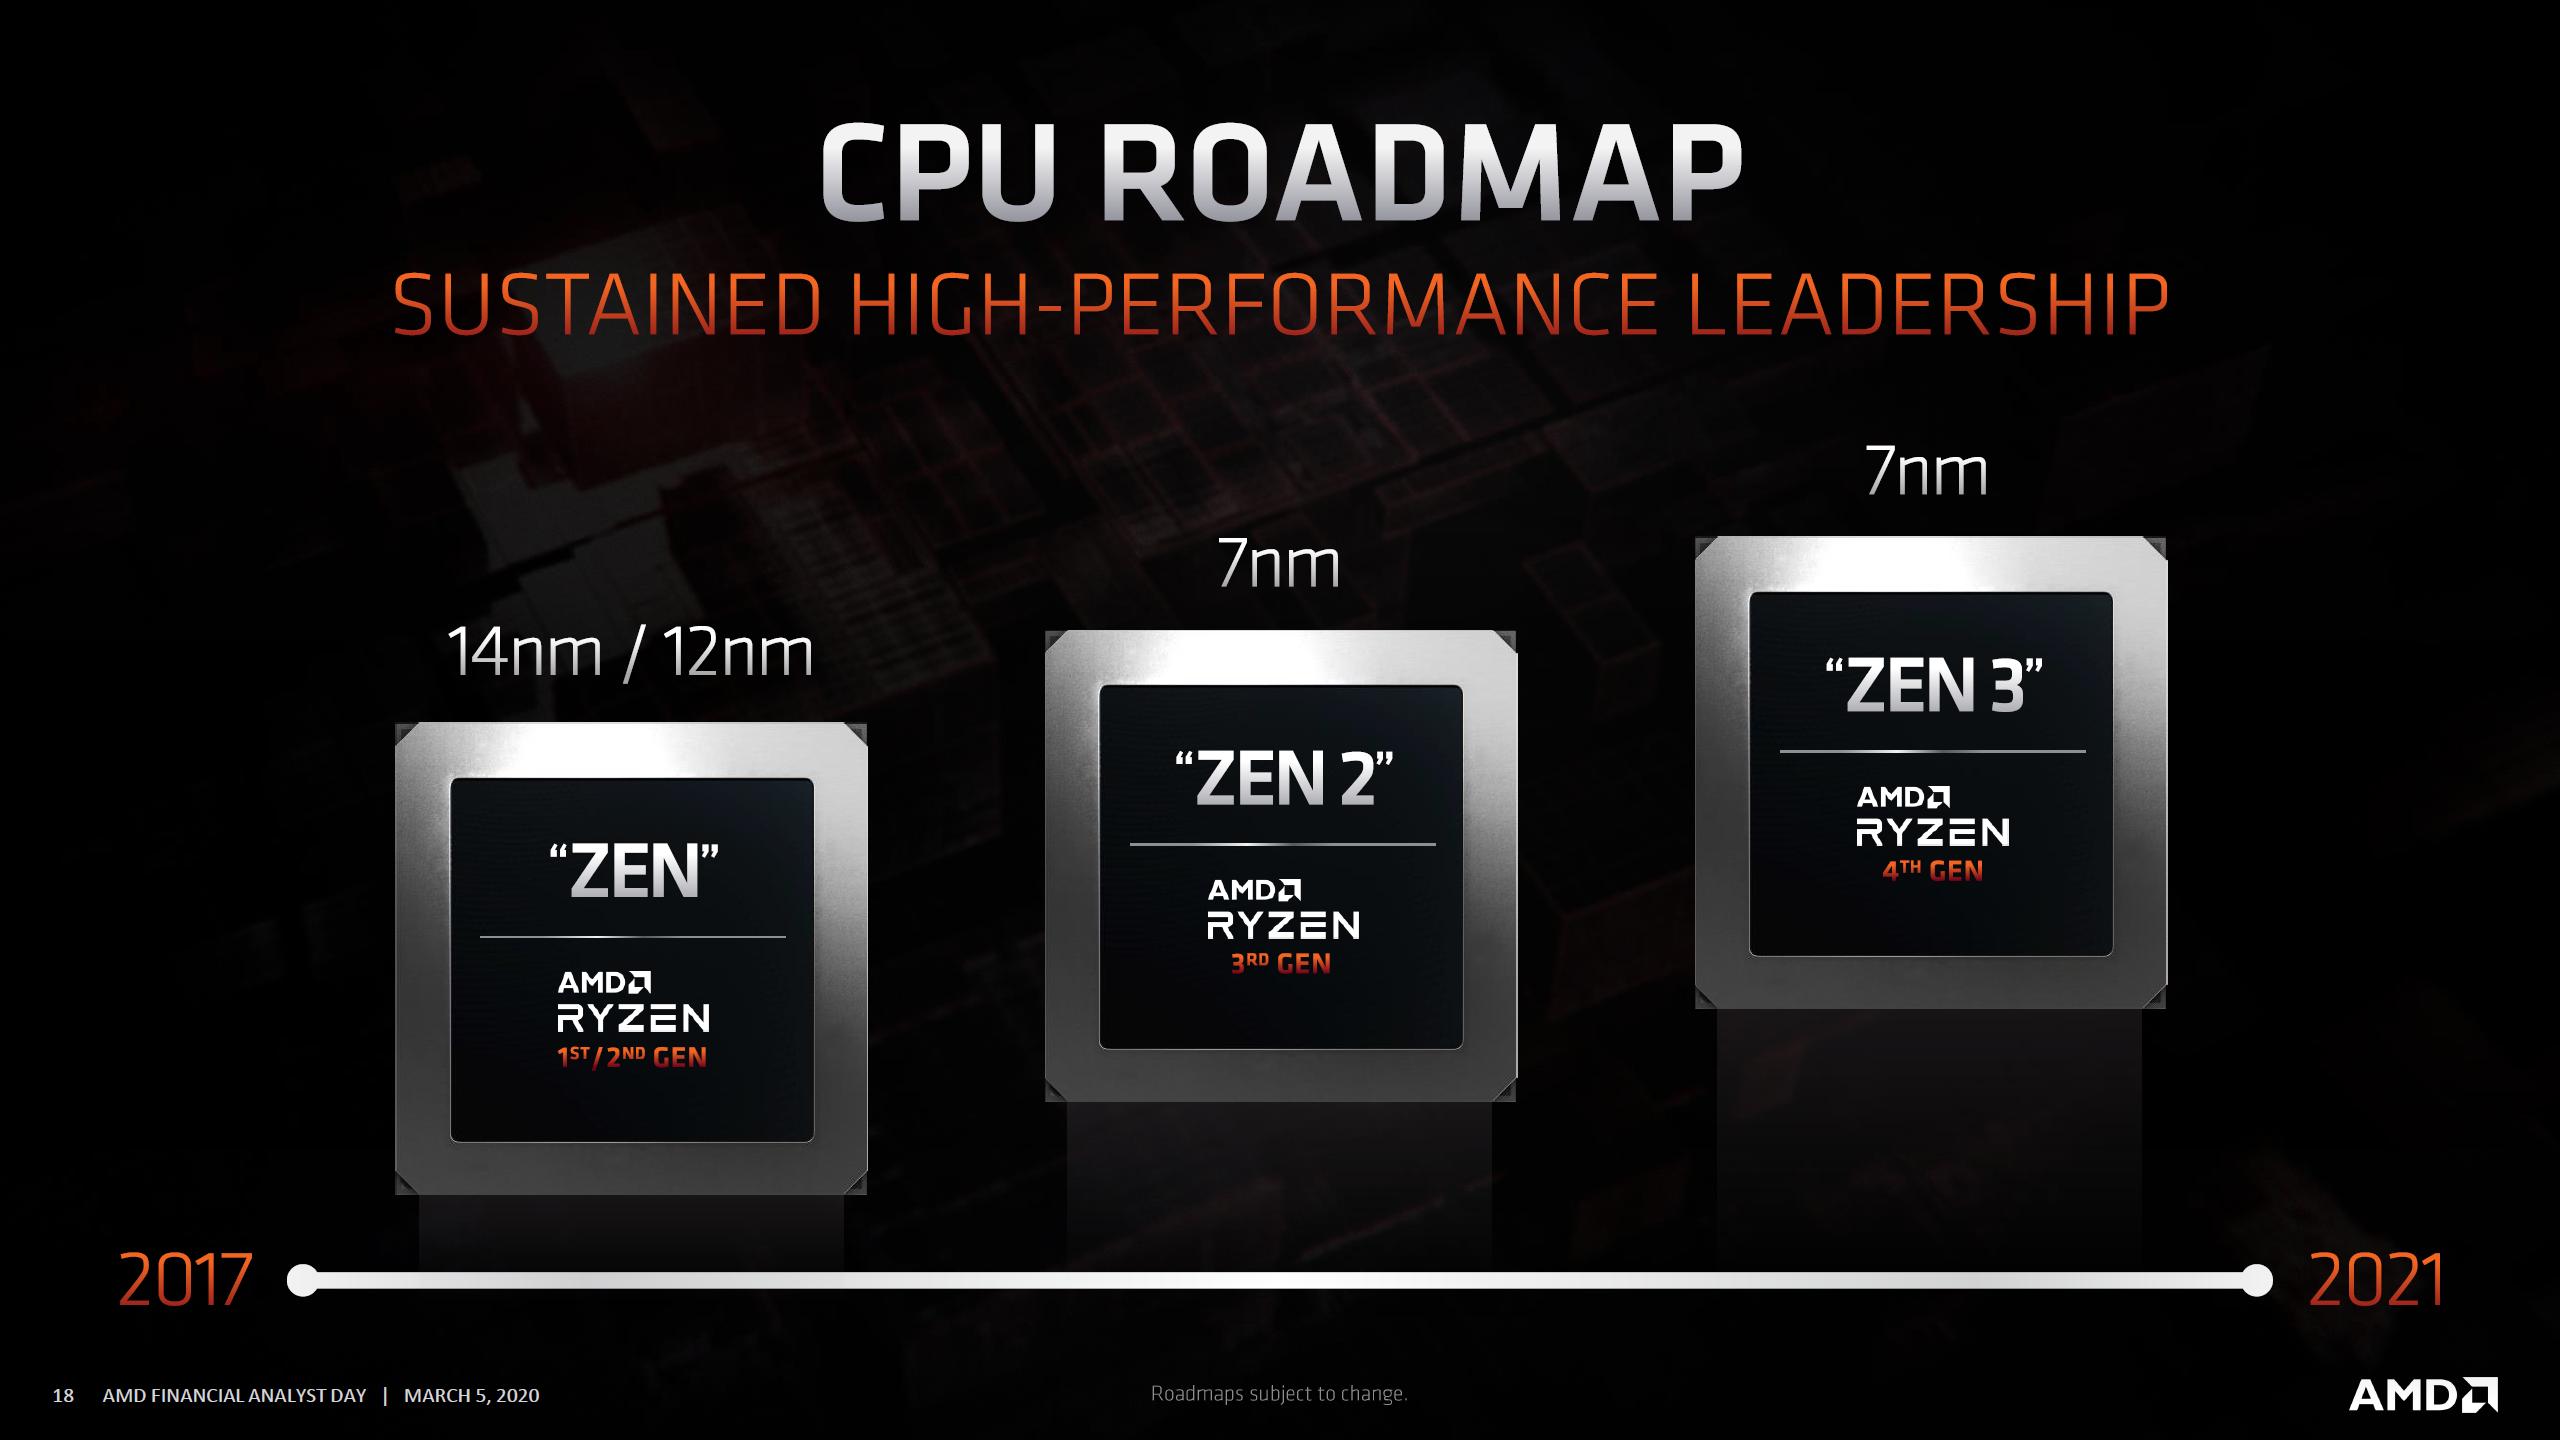 Amd Ryzen 7 3850x 3750x Desktop Cpus Rumored For Mid 2020